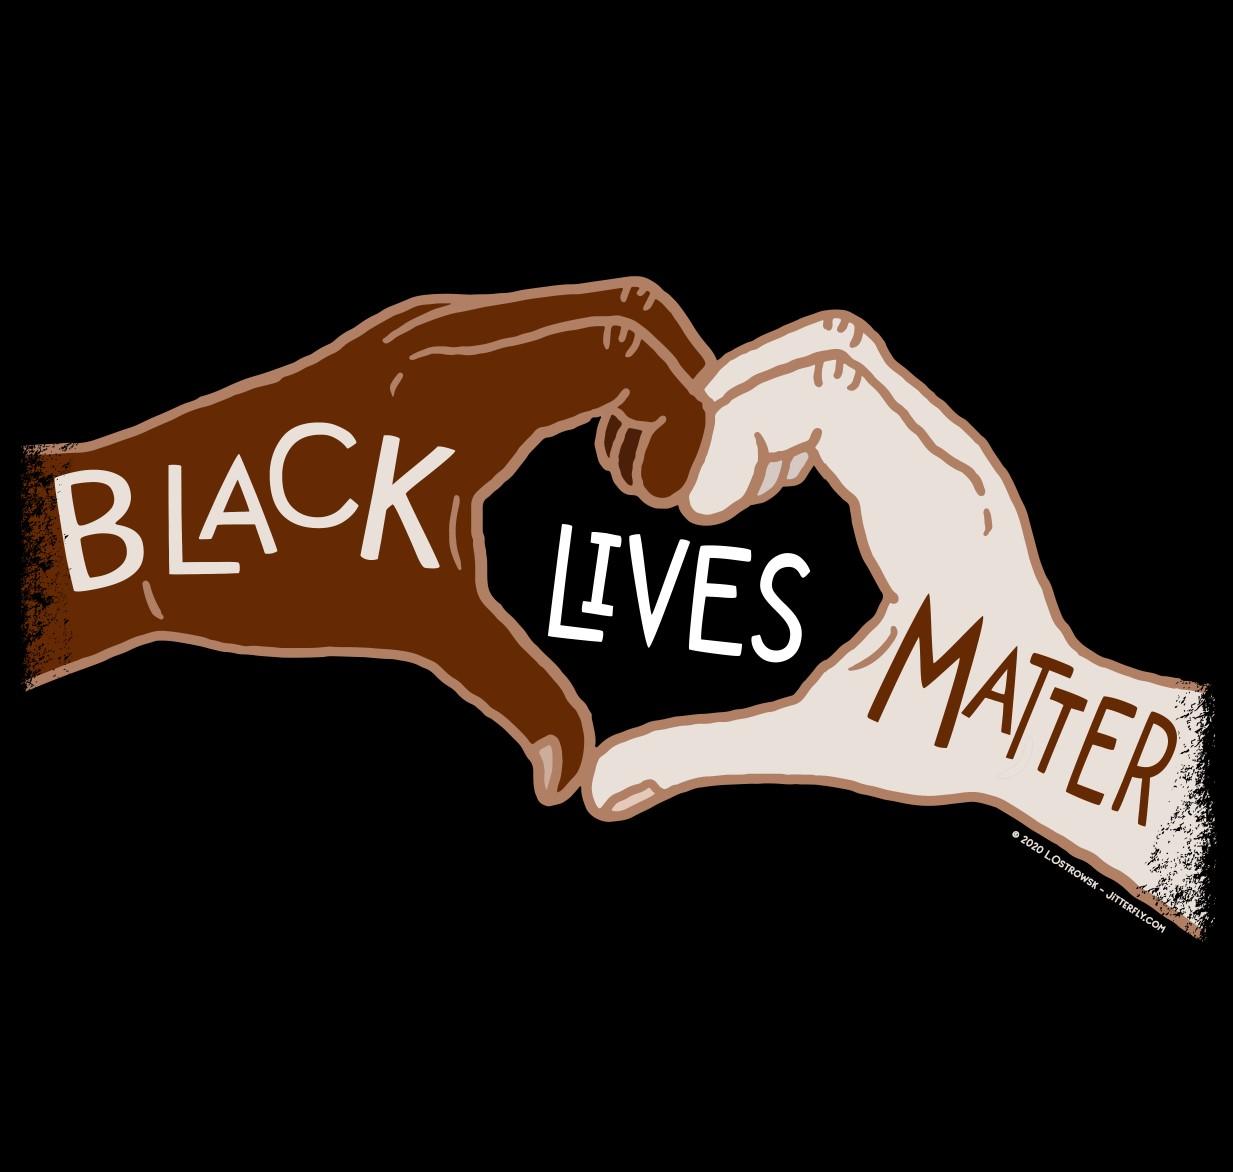 Pin On Art Jitterfly Designs Black Lives Matter Quotes Black Lives Matter Poster Black Lives Matter Art